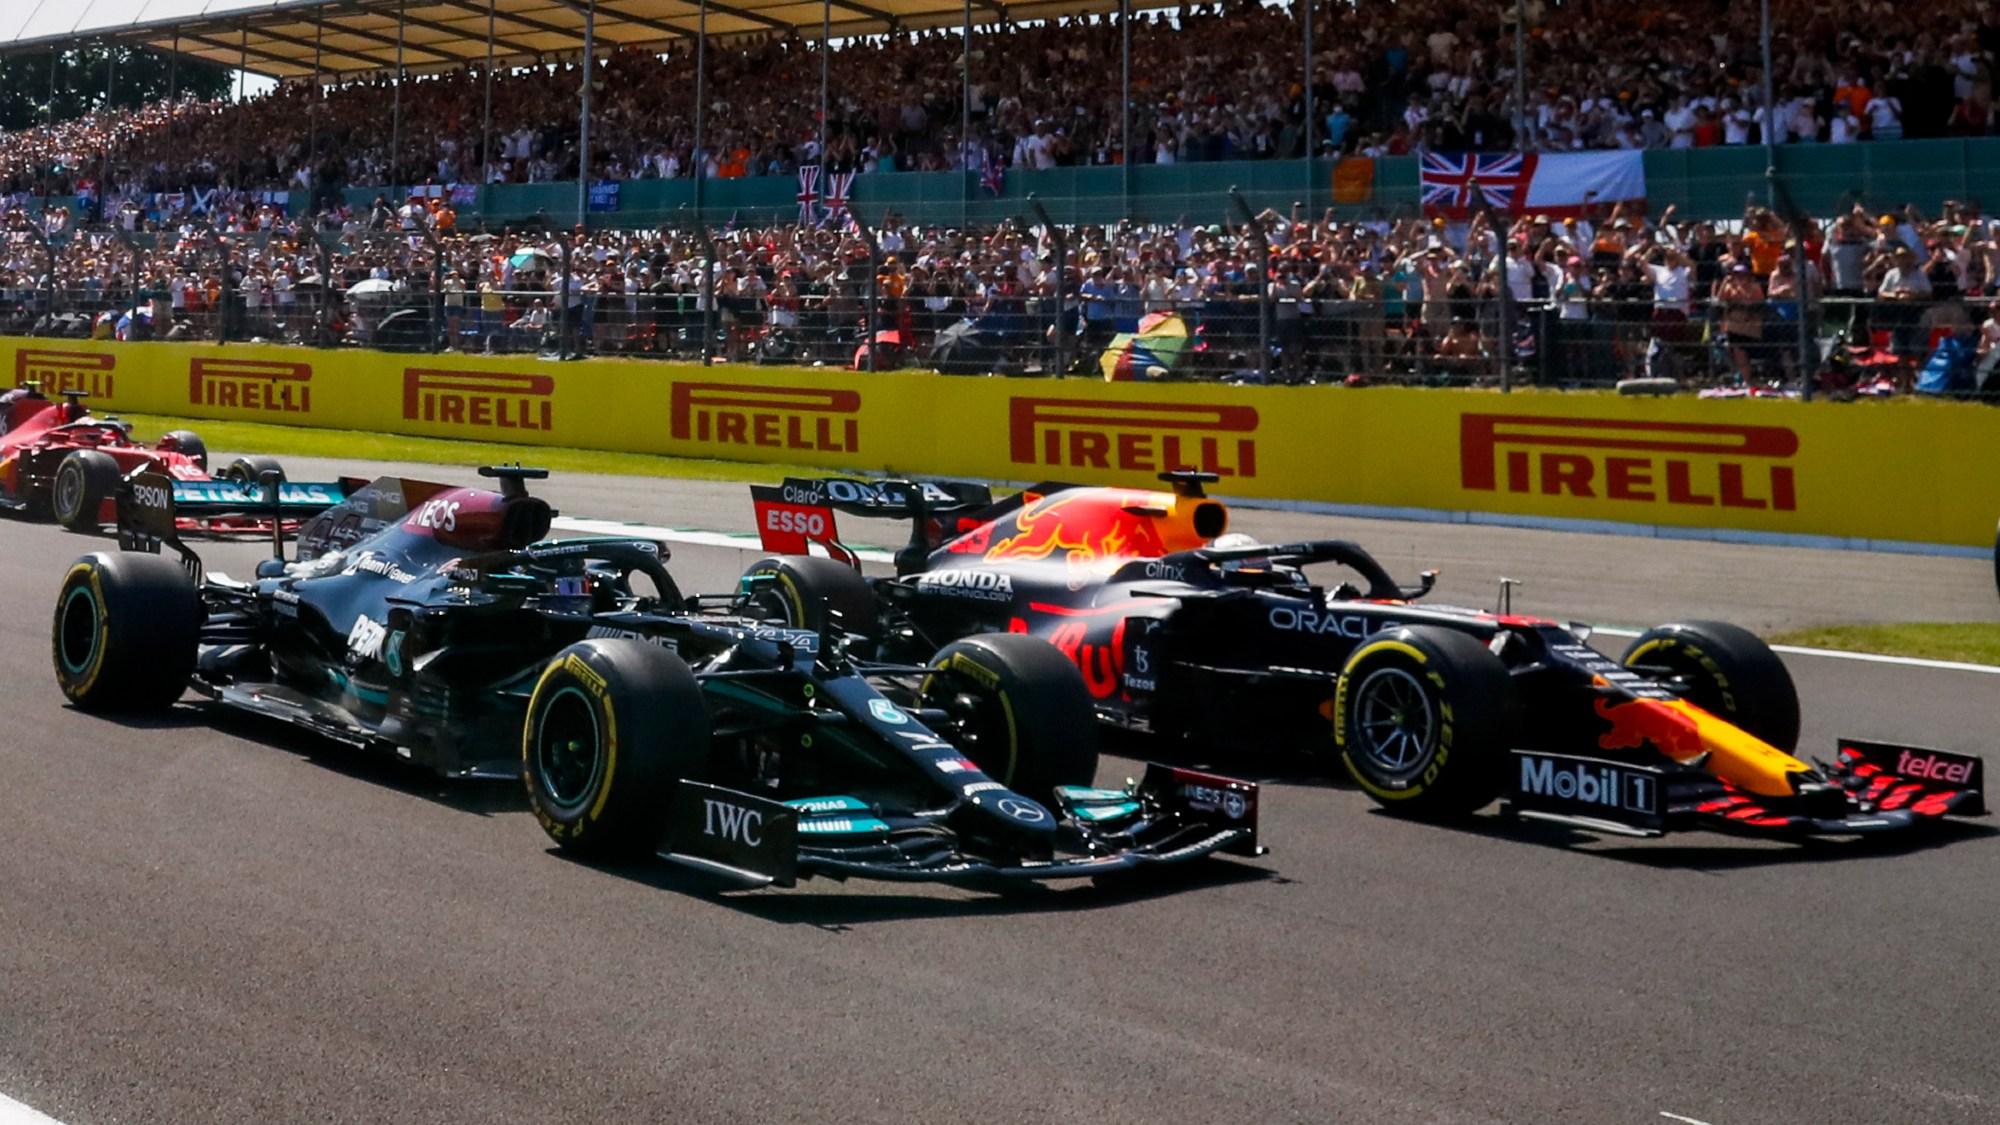 Lewis Hamilton, Max VERSTAPPEN, 2021 British GP